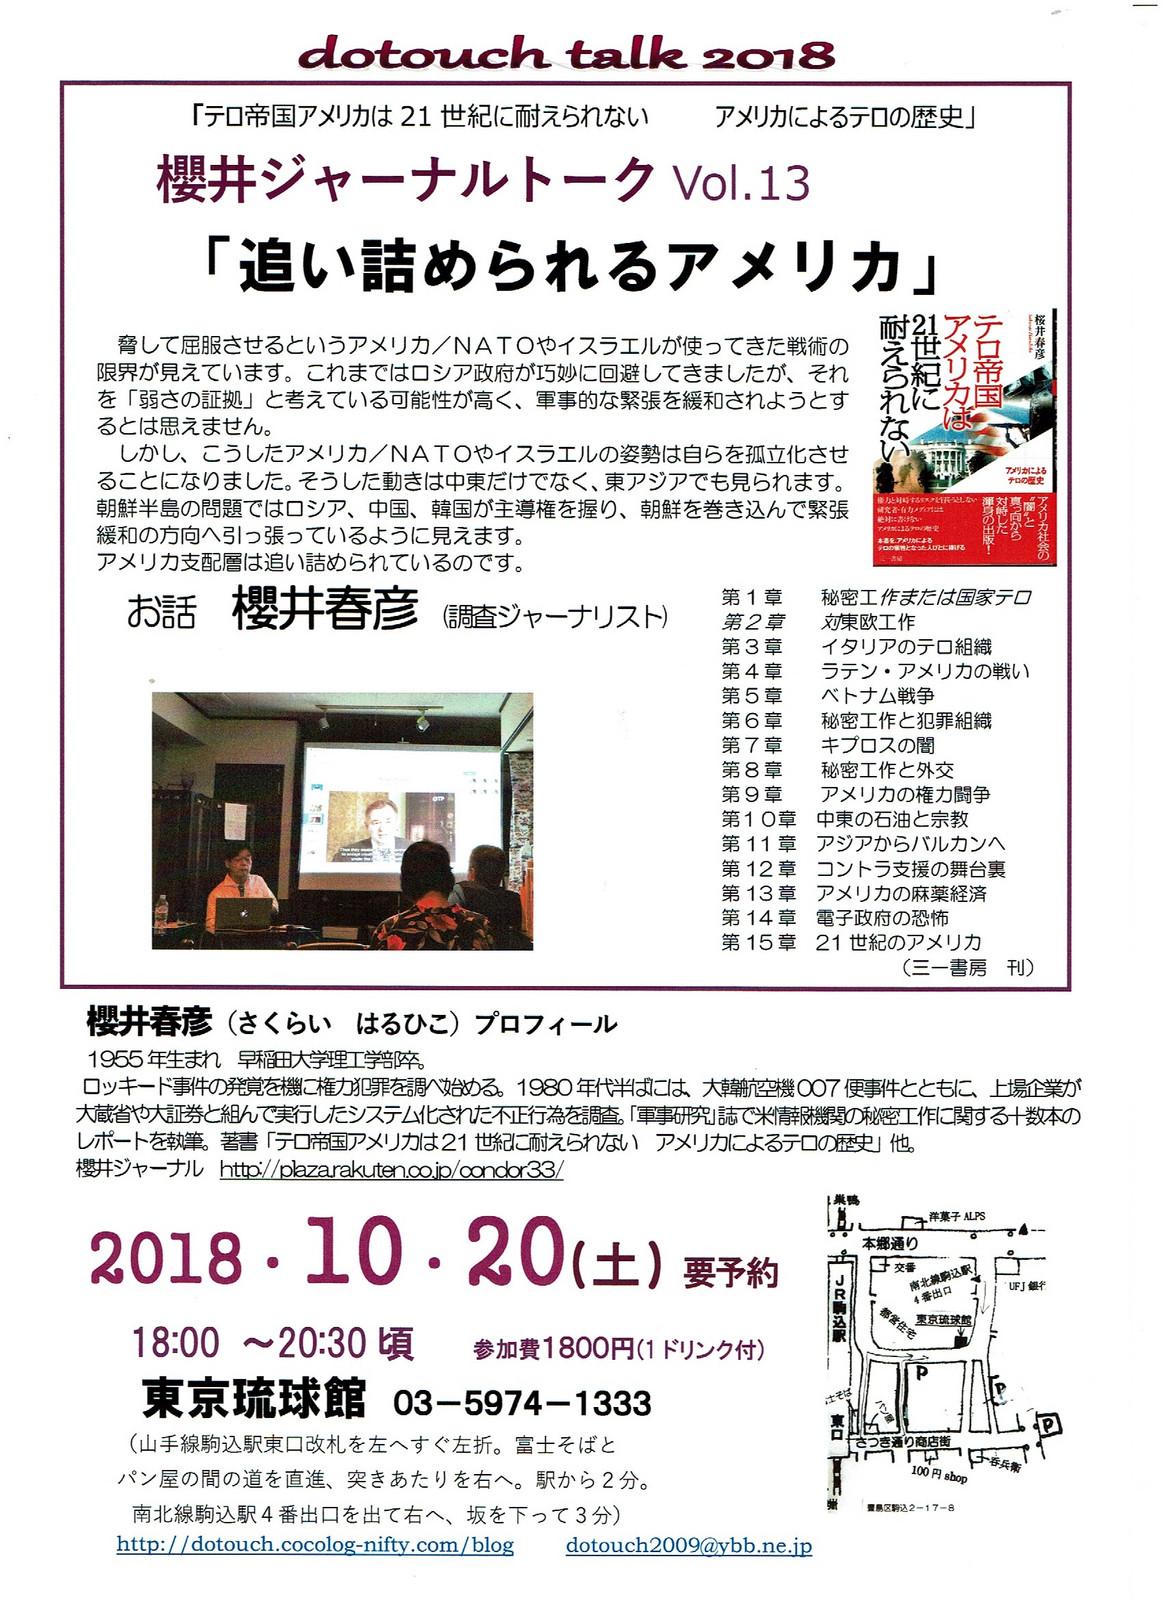 Sakurai_j13_2